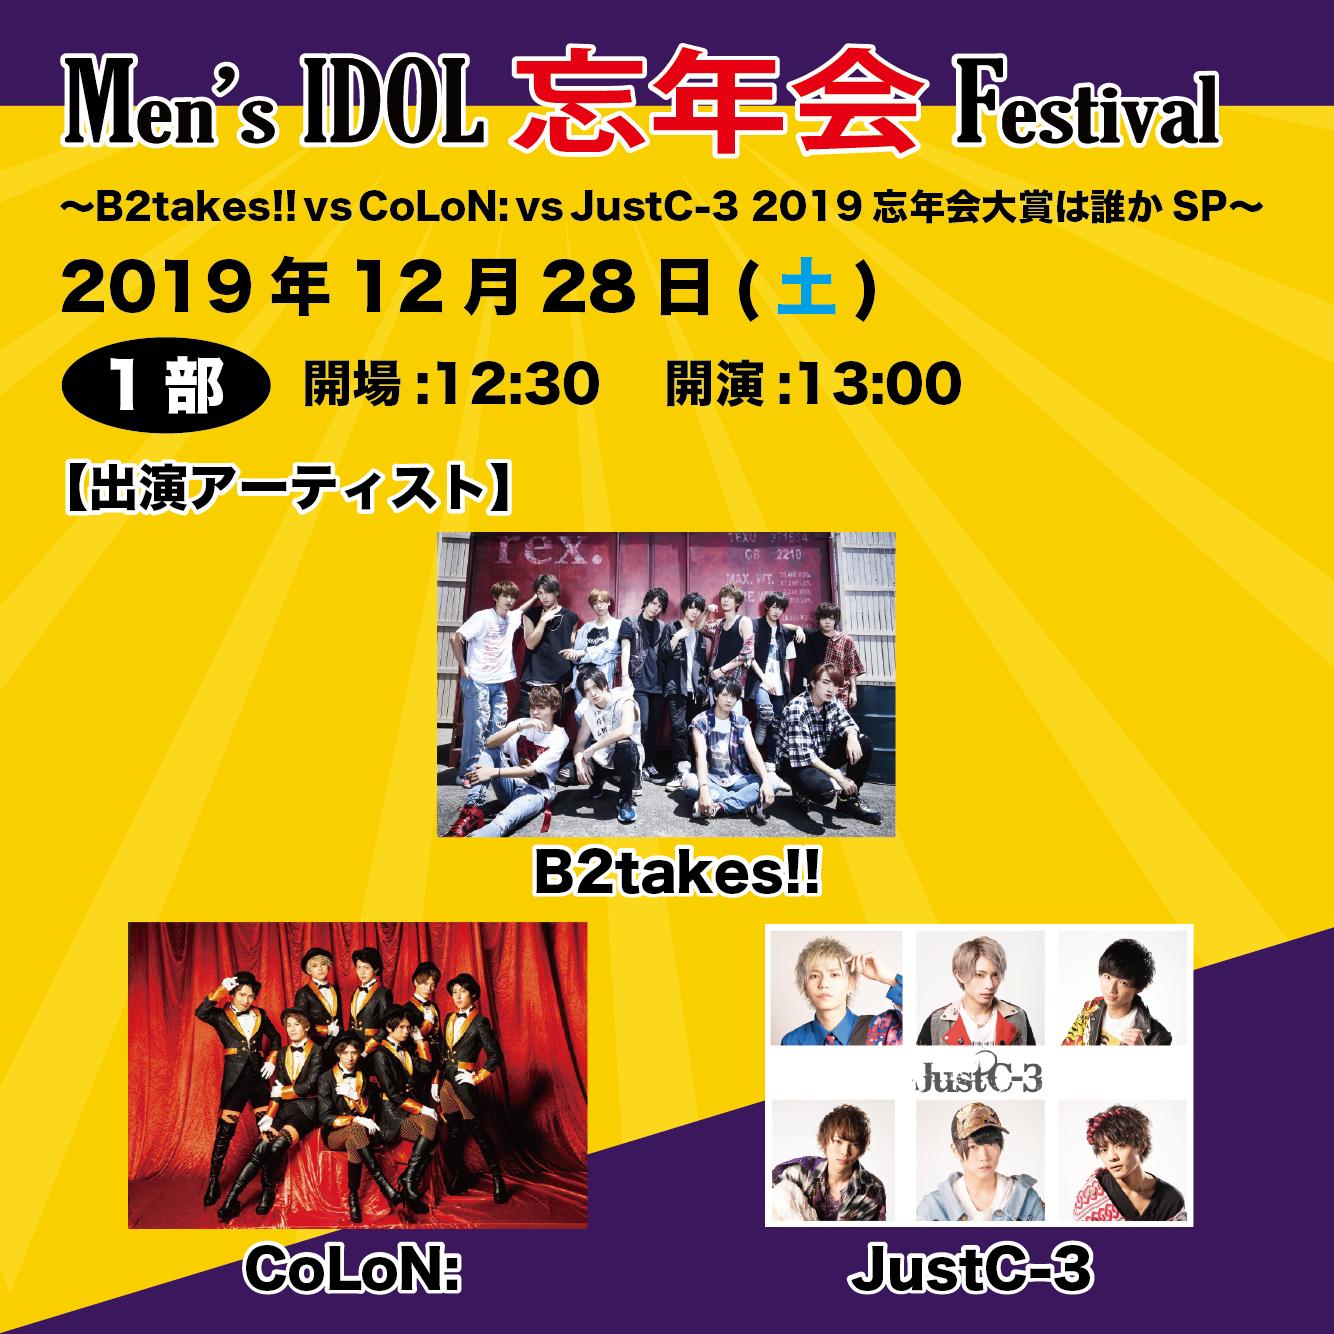 Men's IDOL 忘年会 Festival!〜B2takes!!vsCoLoN:vsJustC-3 2019忘年会大賞は誰かSP〜